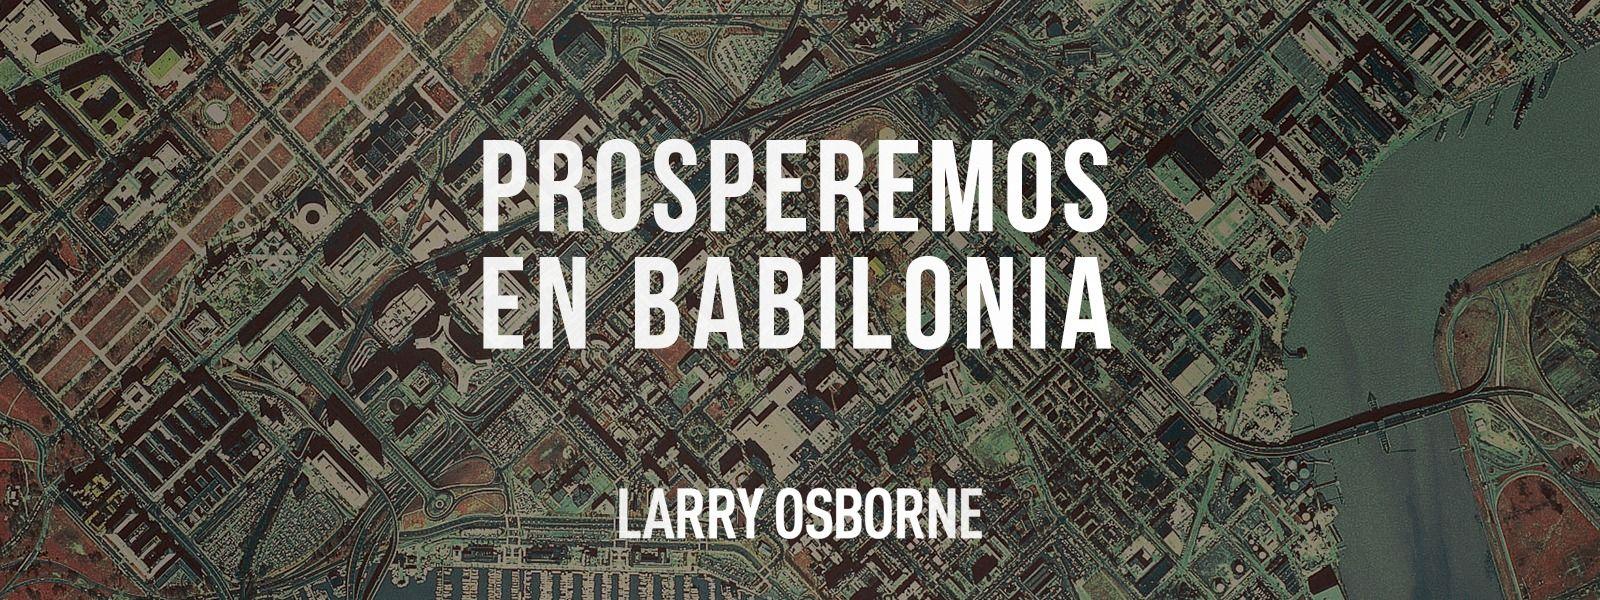 Prosperemos en Babilonia